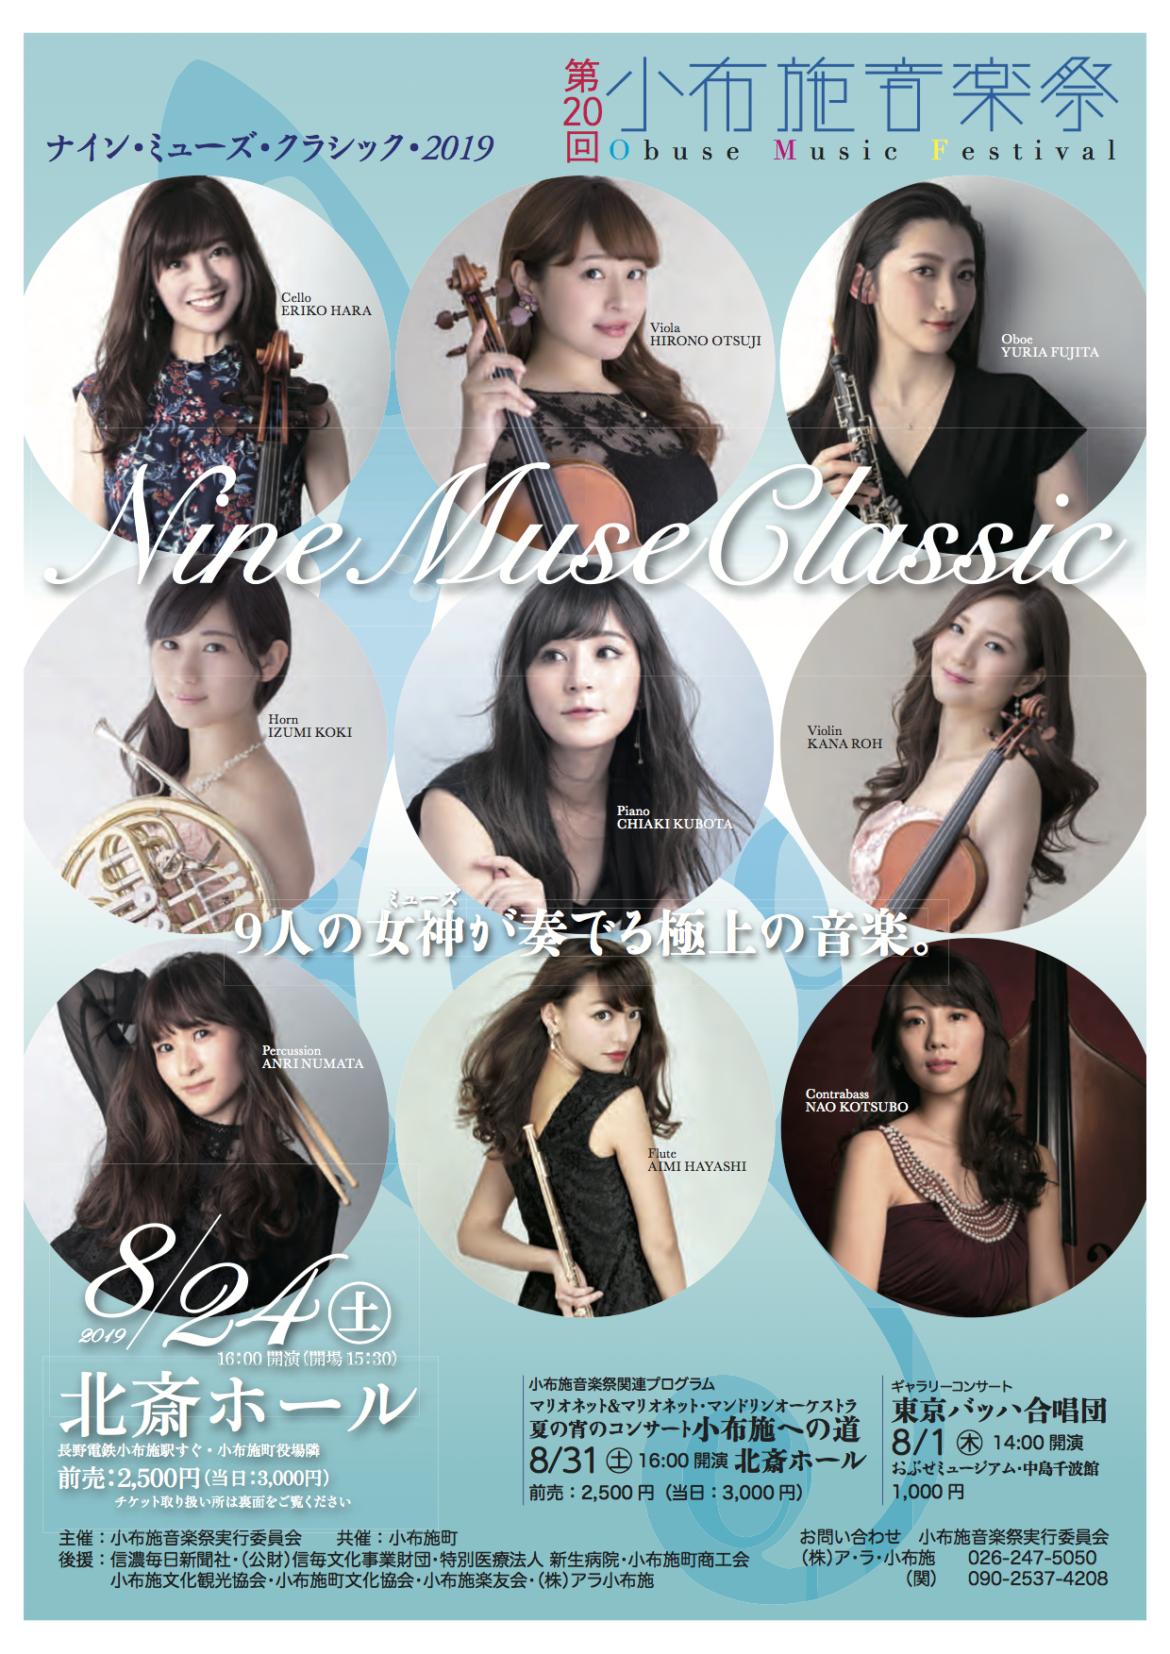 2019.8.24 第20回小布施音楽祭 〜 Nine Muse Classic 2019 〜